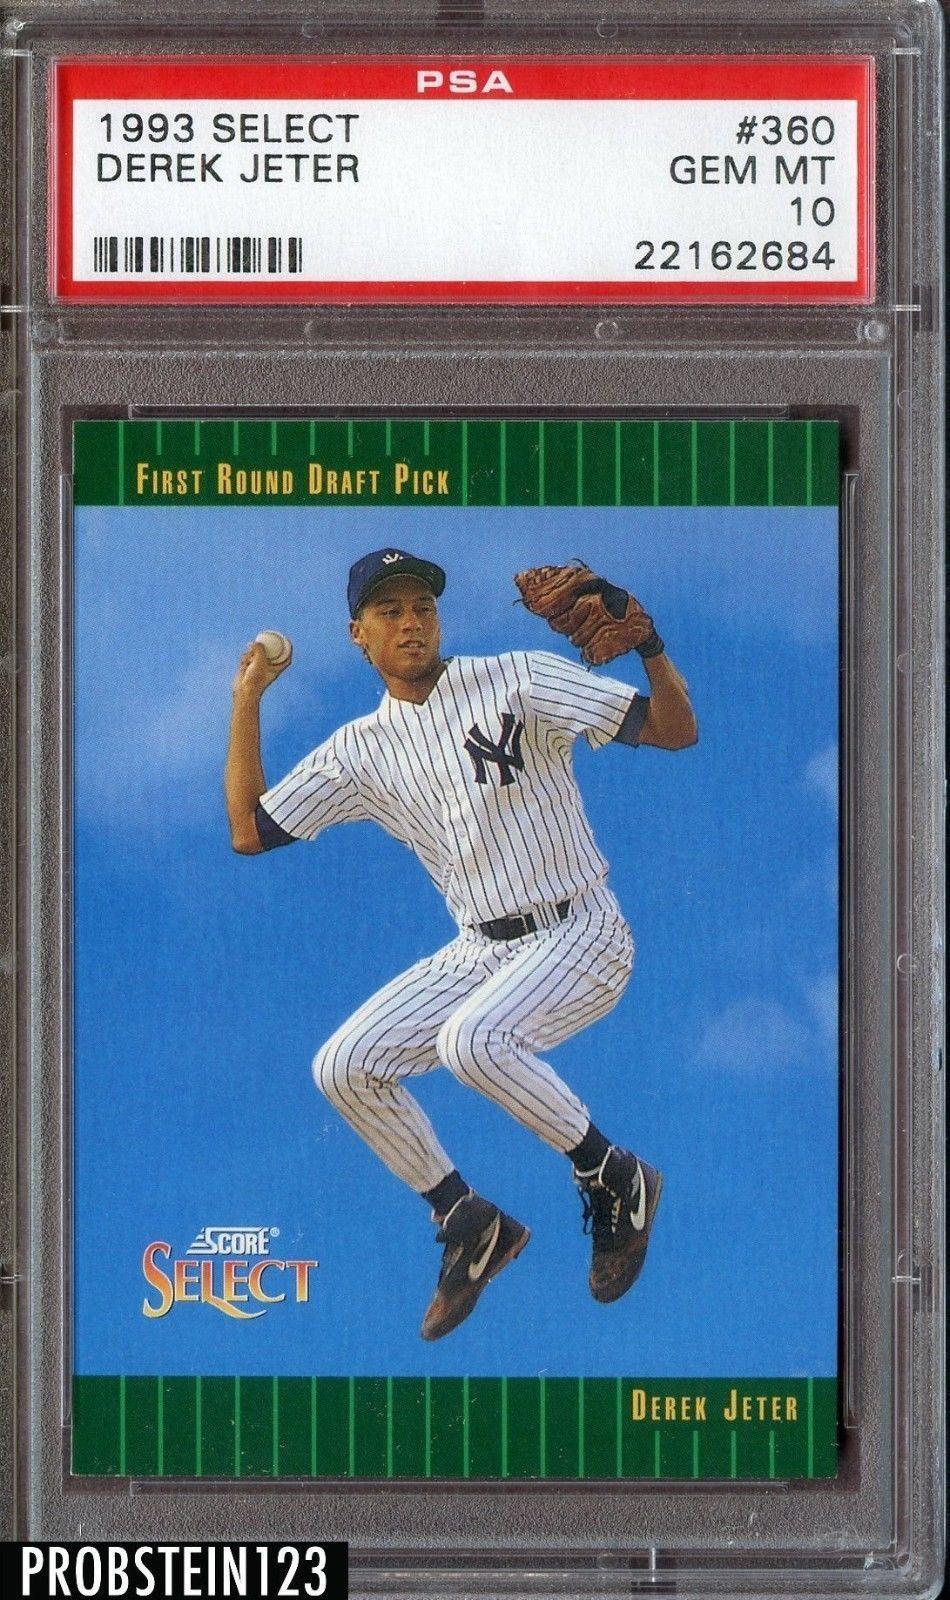 1993 select derek jeter baseball cards new york yankees